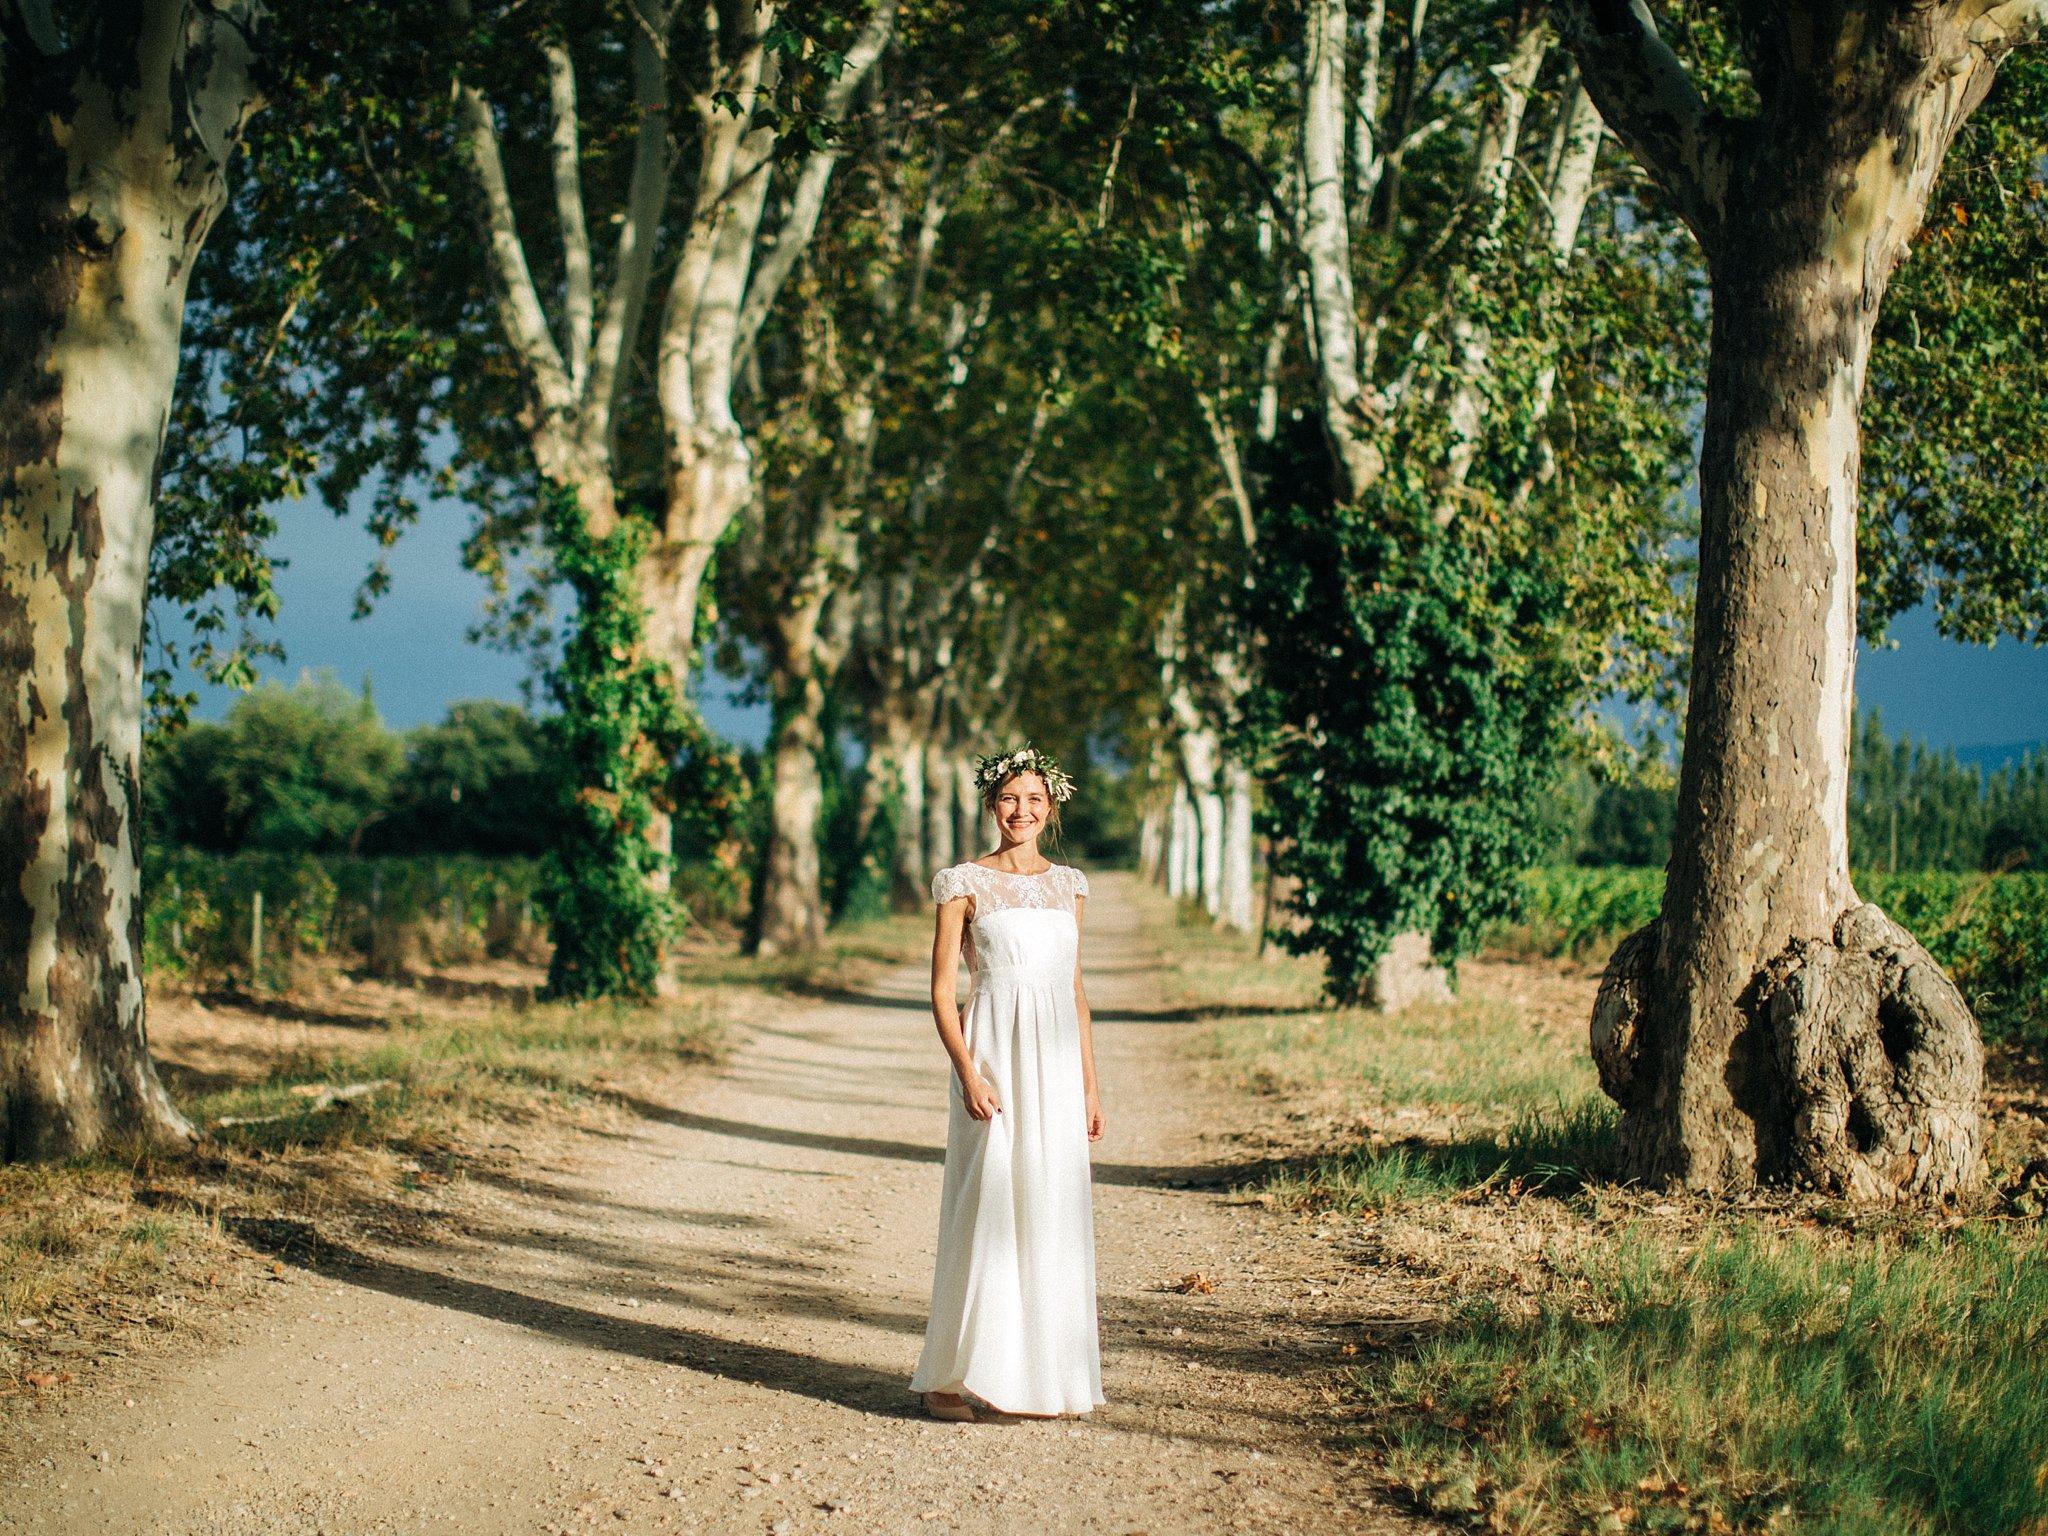 Wedding Photographer Perpignan - Château Las Collas Wedding - Hugo Hennequin097.jpg